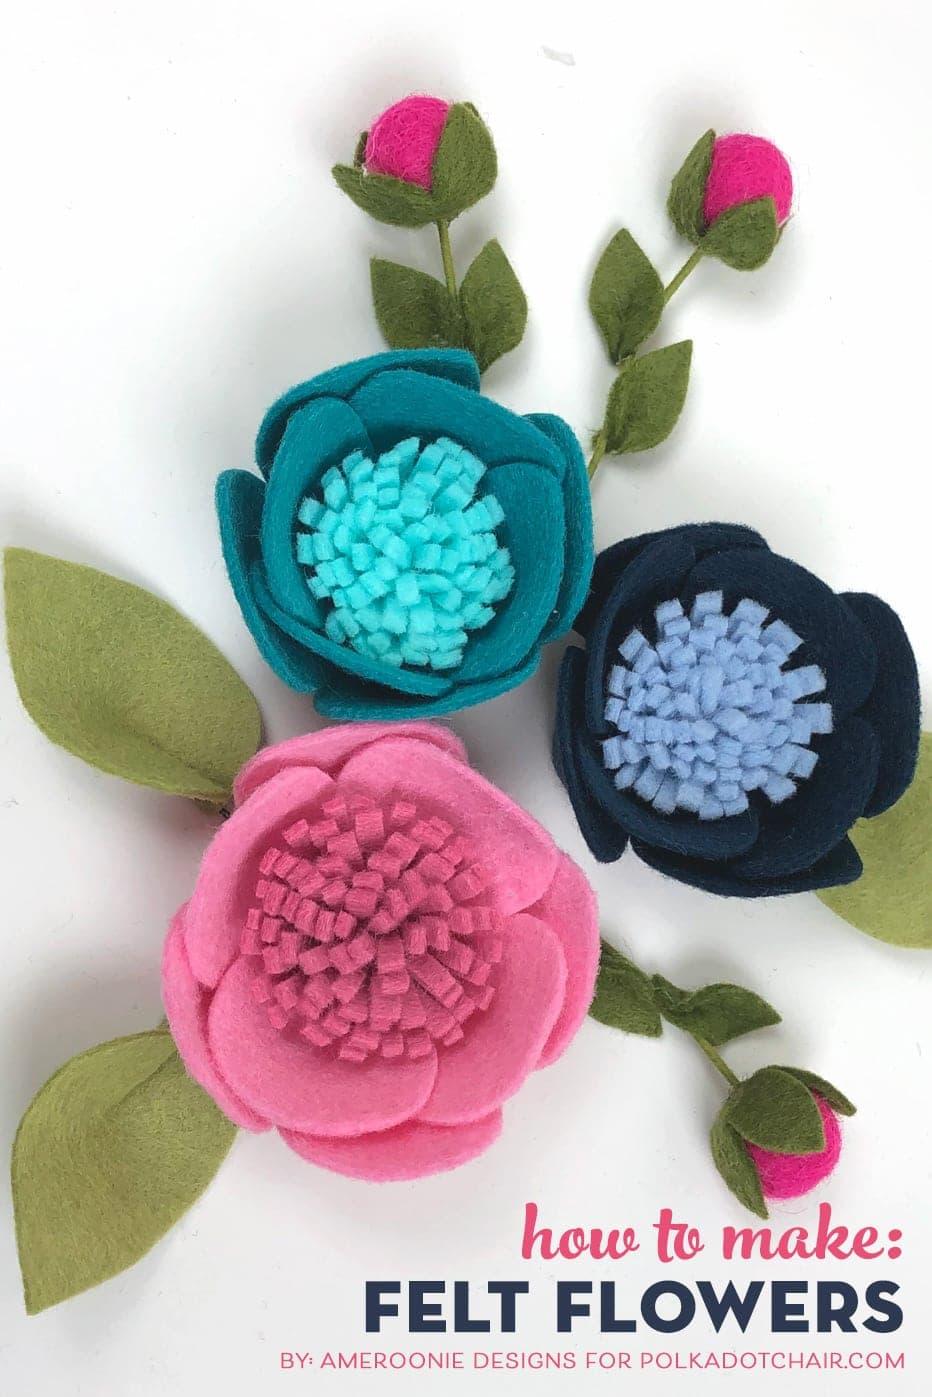 How to make Adorable Felt Flowers